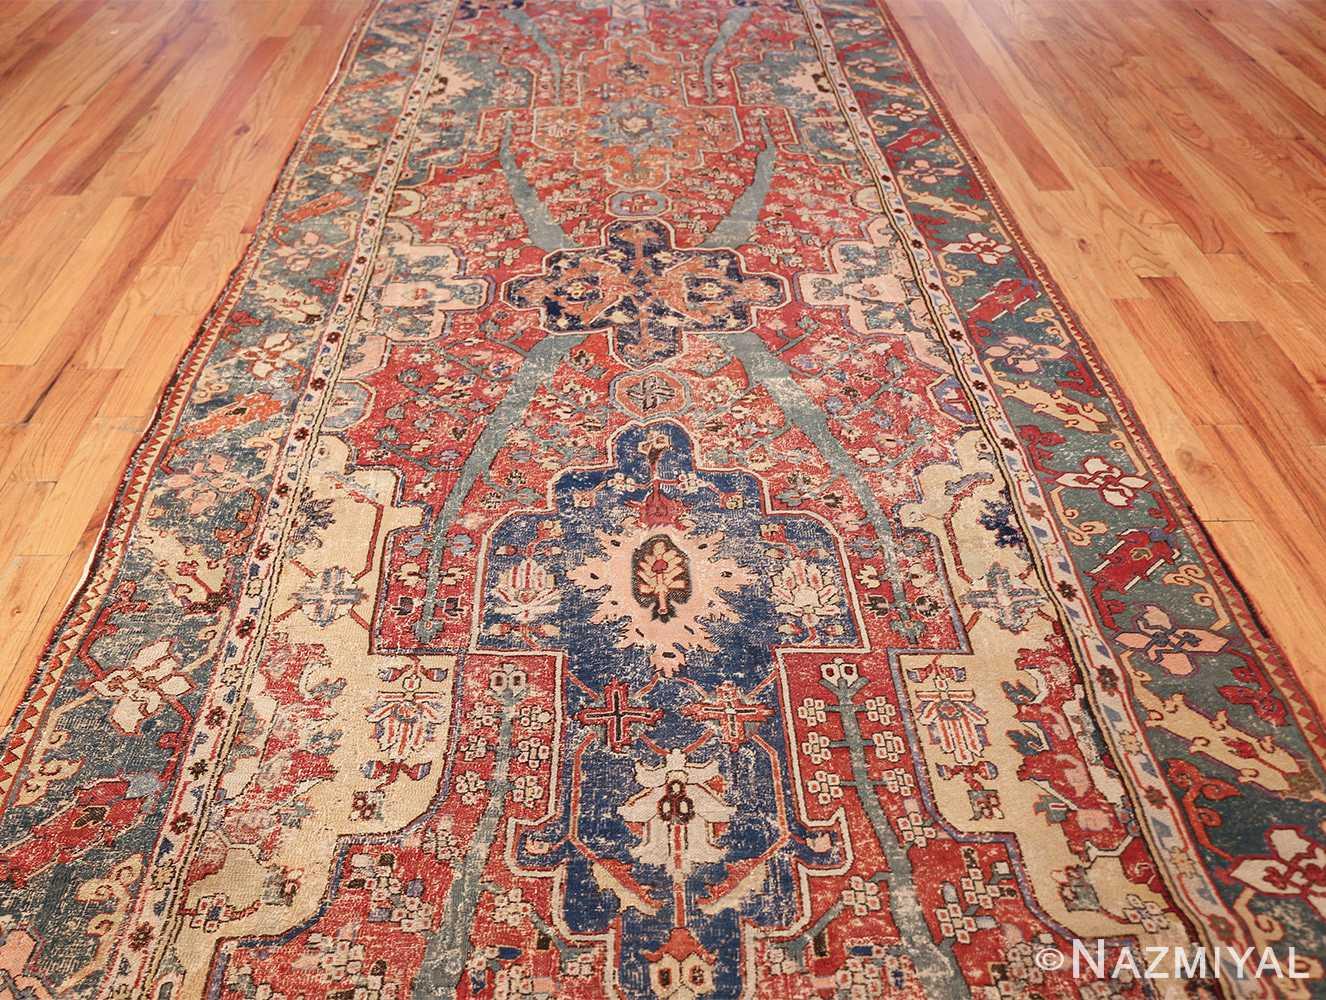 rare antique 17th century gallery size khorassan persian rug 3289 center Nazmiyal